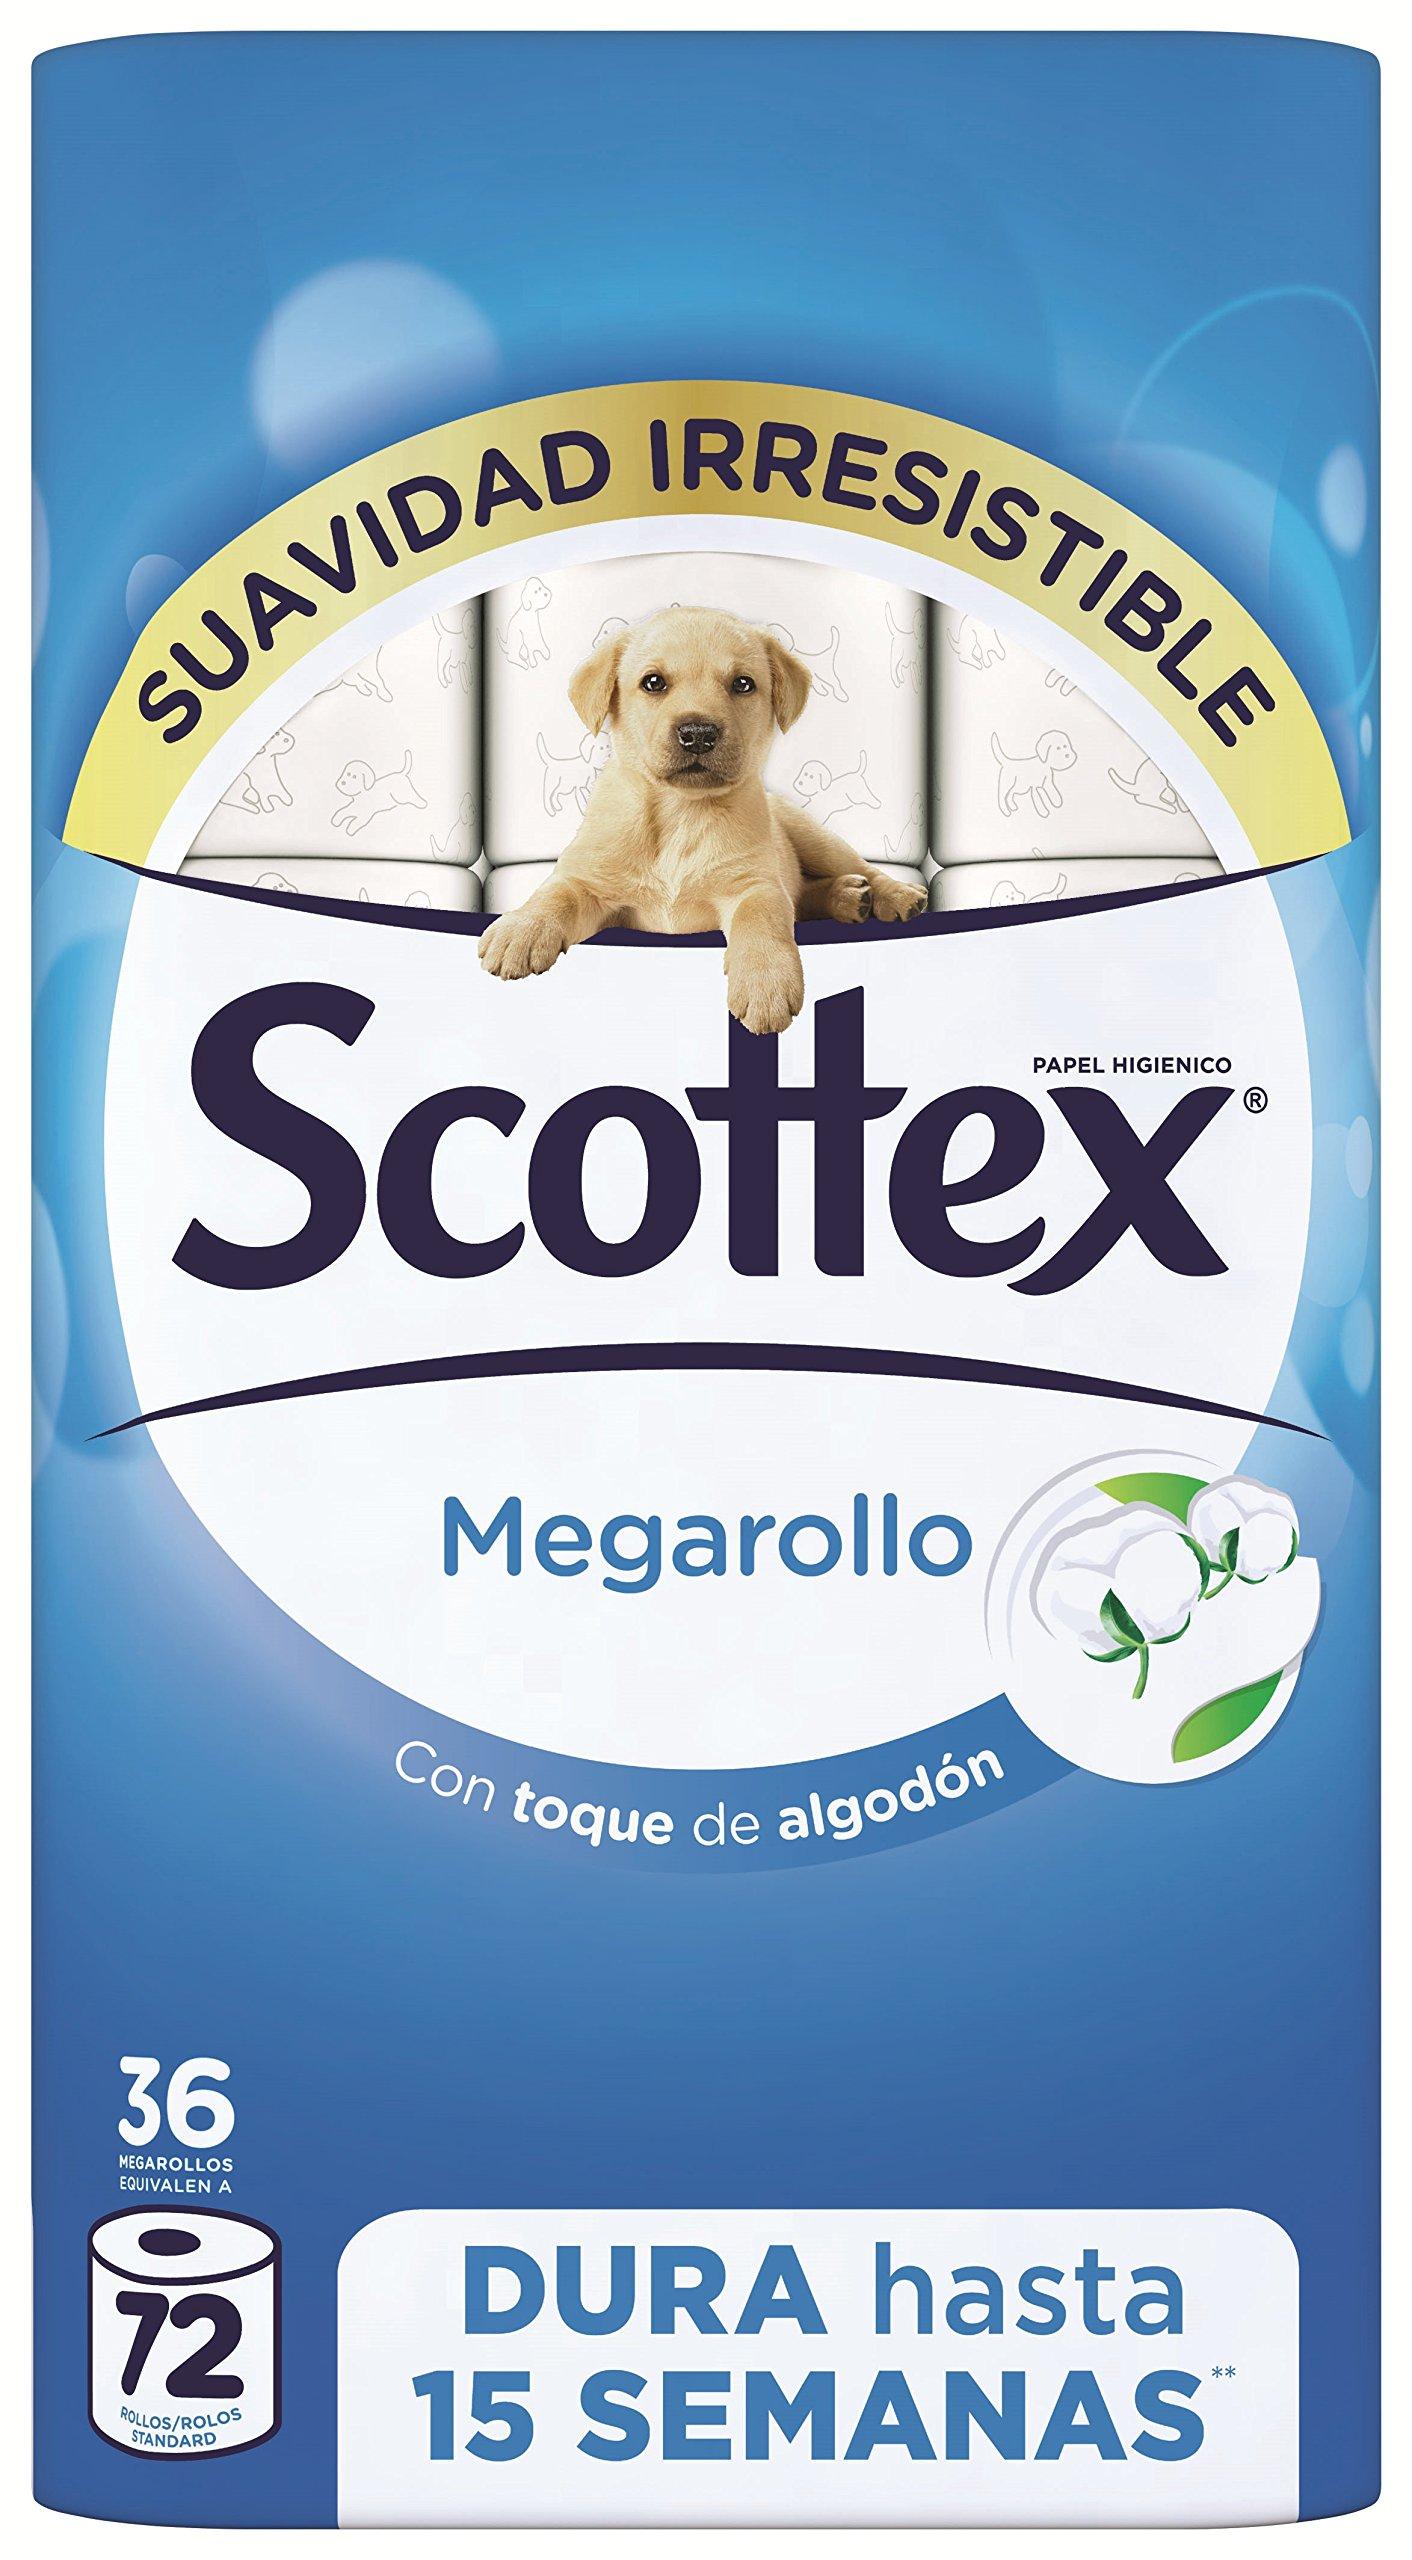 Scottex Megarollo Papel Higiénico - 36 Rollos